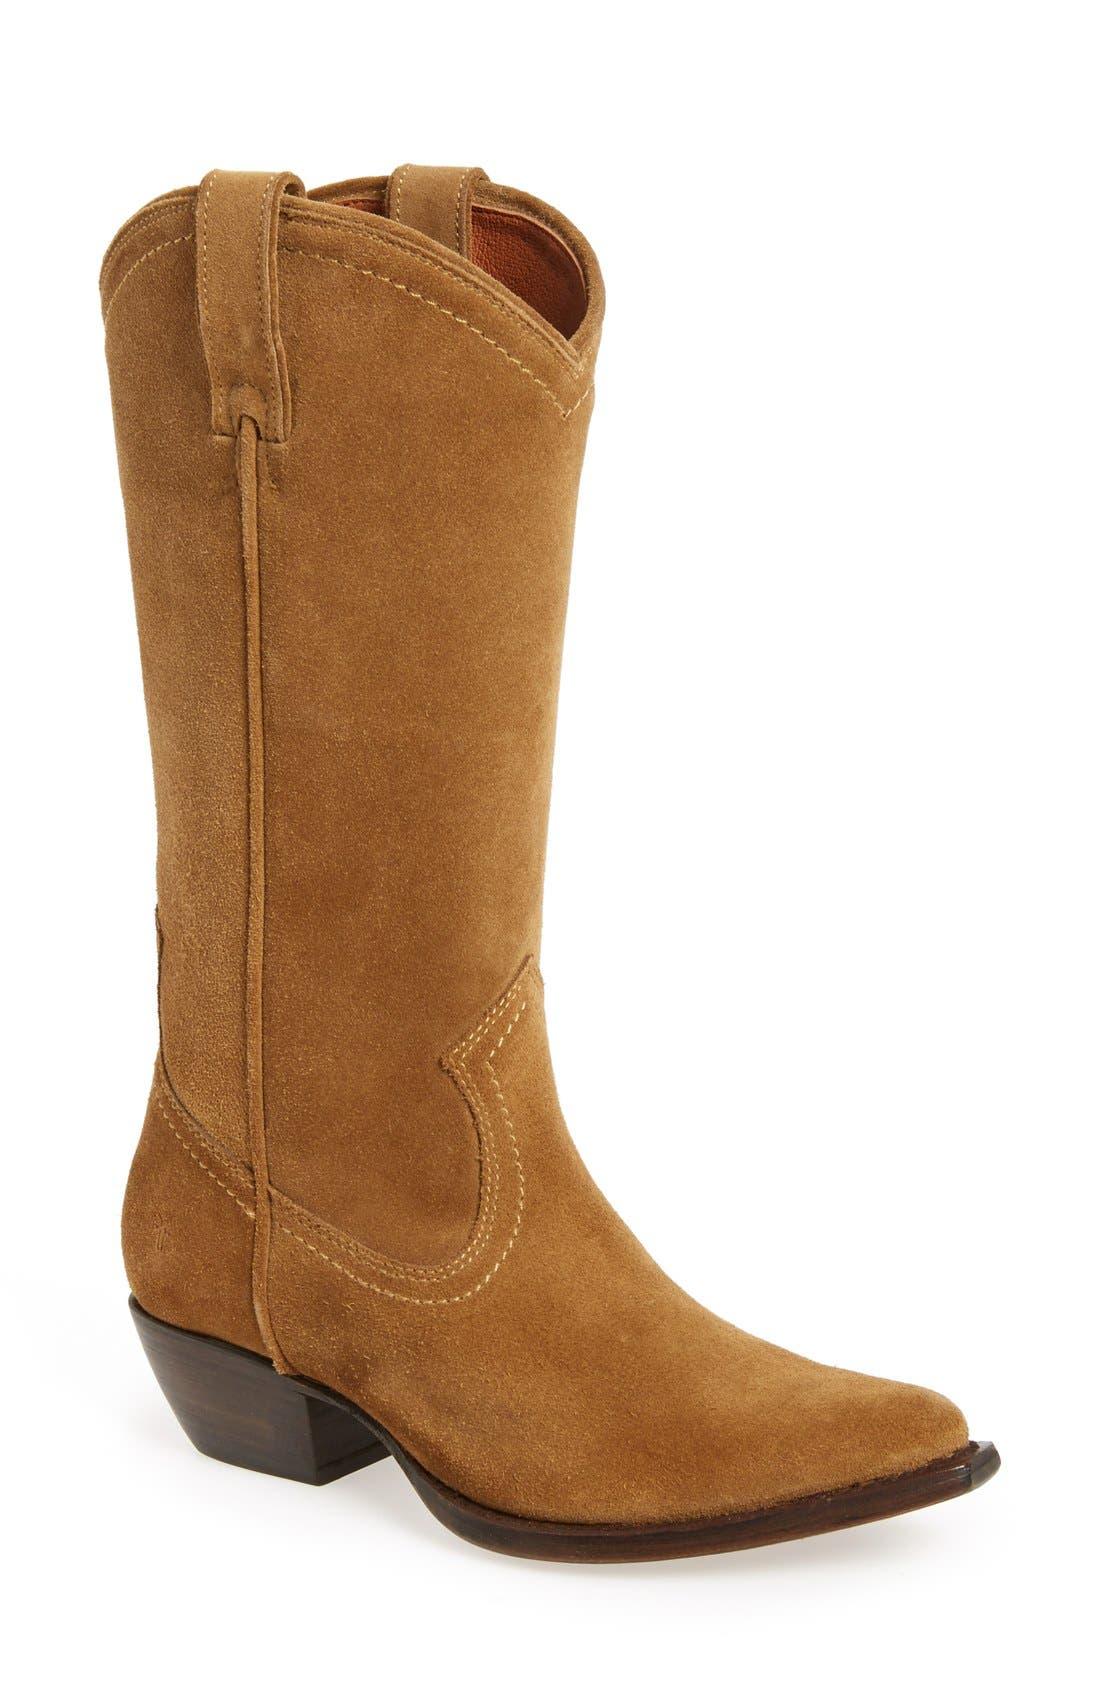 Alternate Image 1 Selected - Frye 'Sacha' Boot (Women)